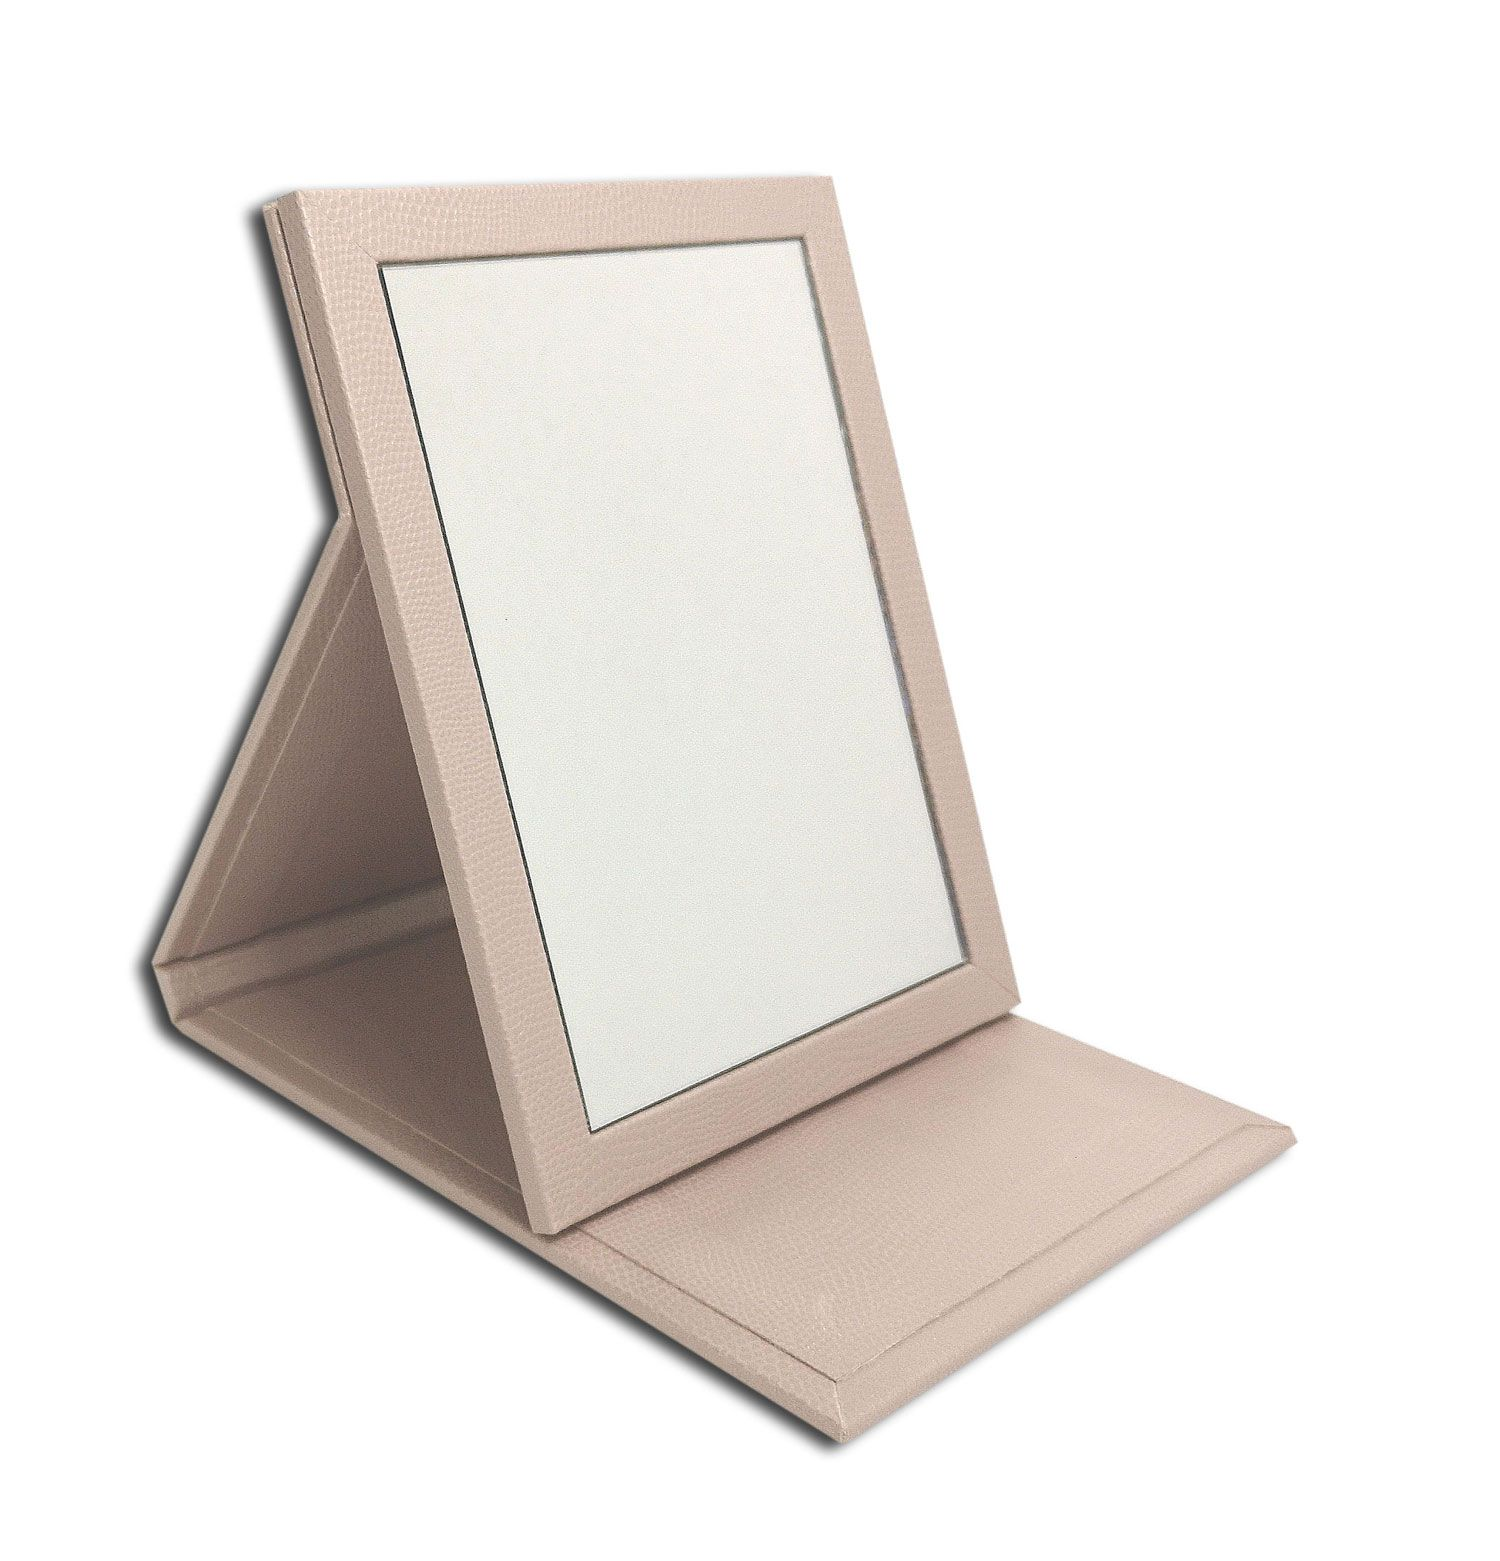 Espelho multiuso Luxo - Bege